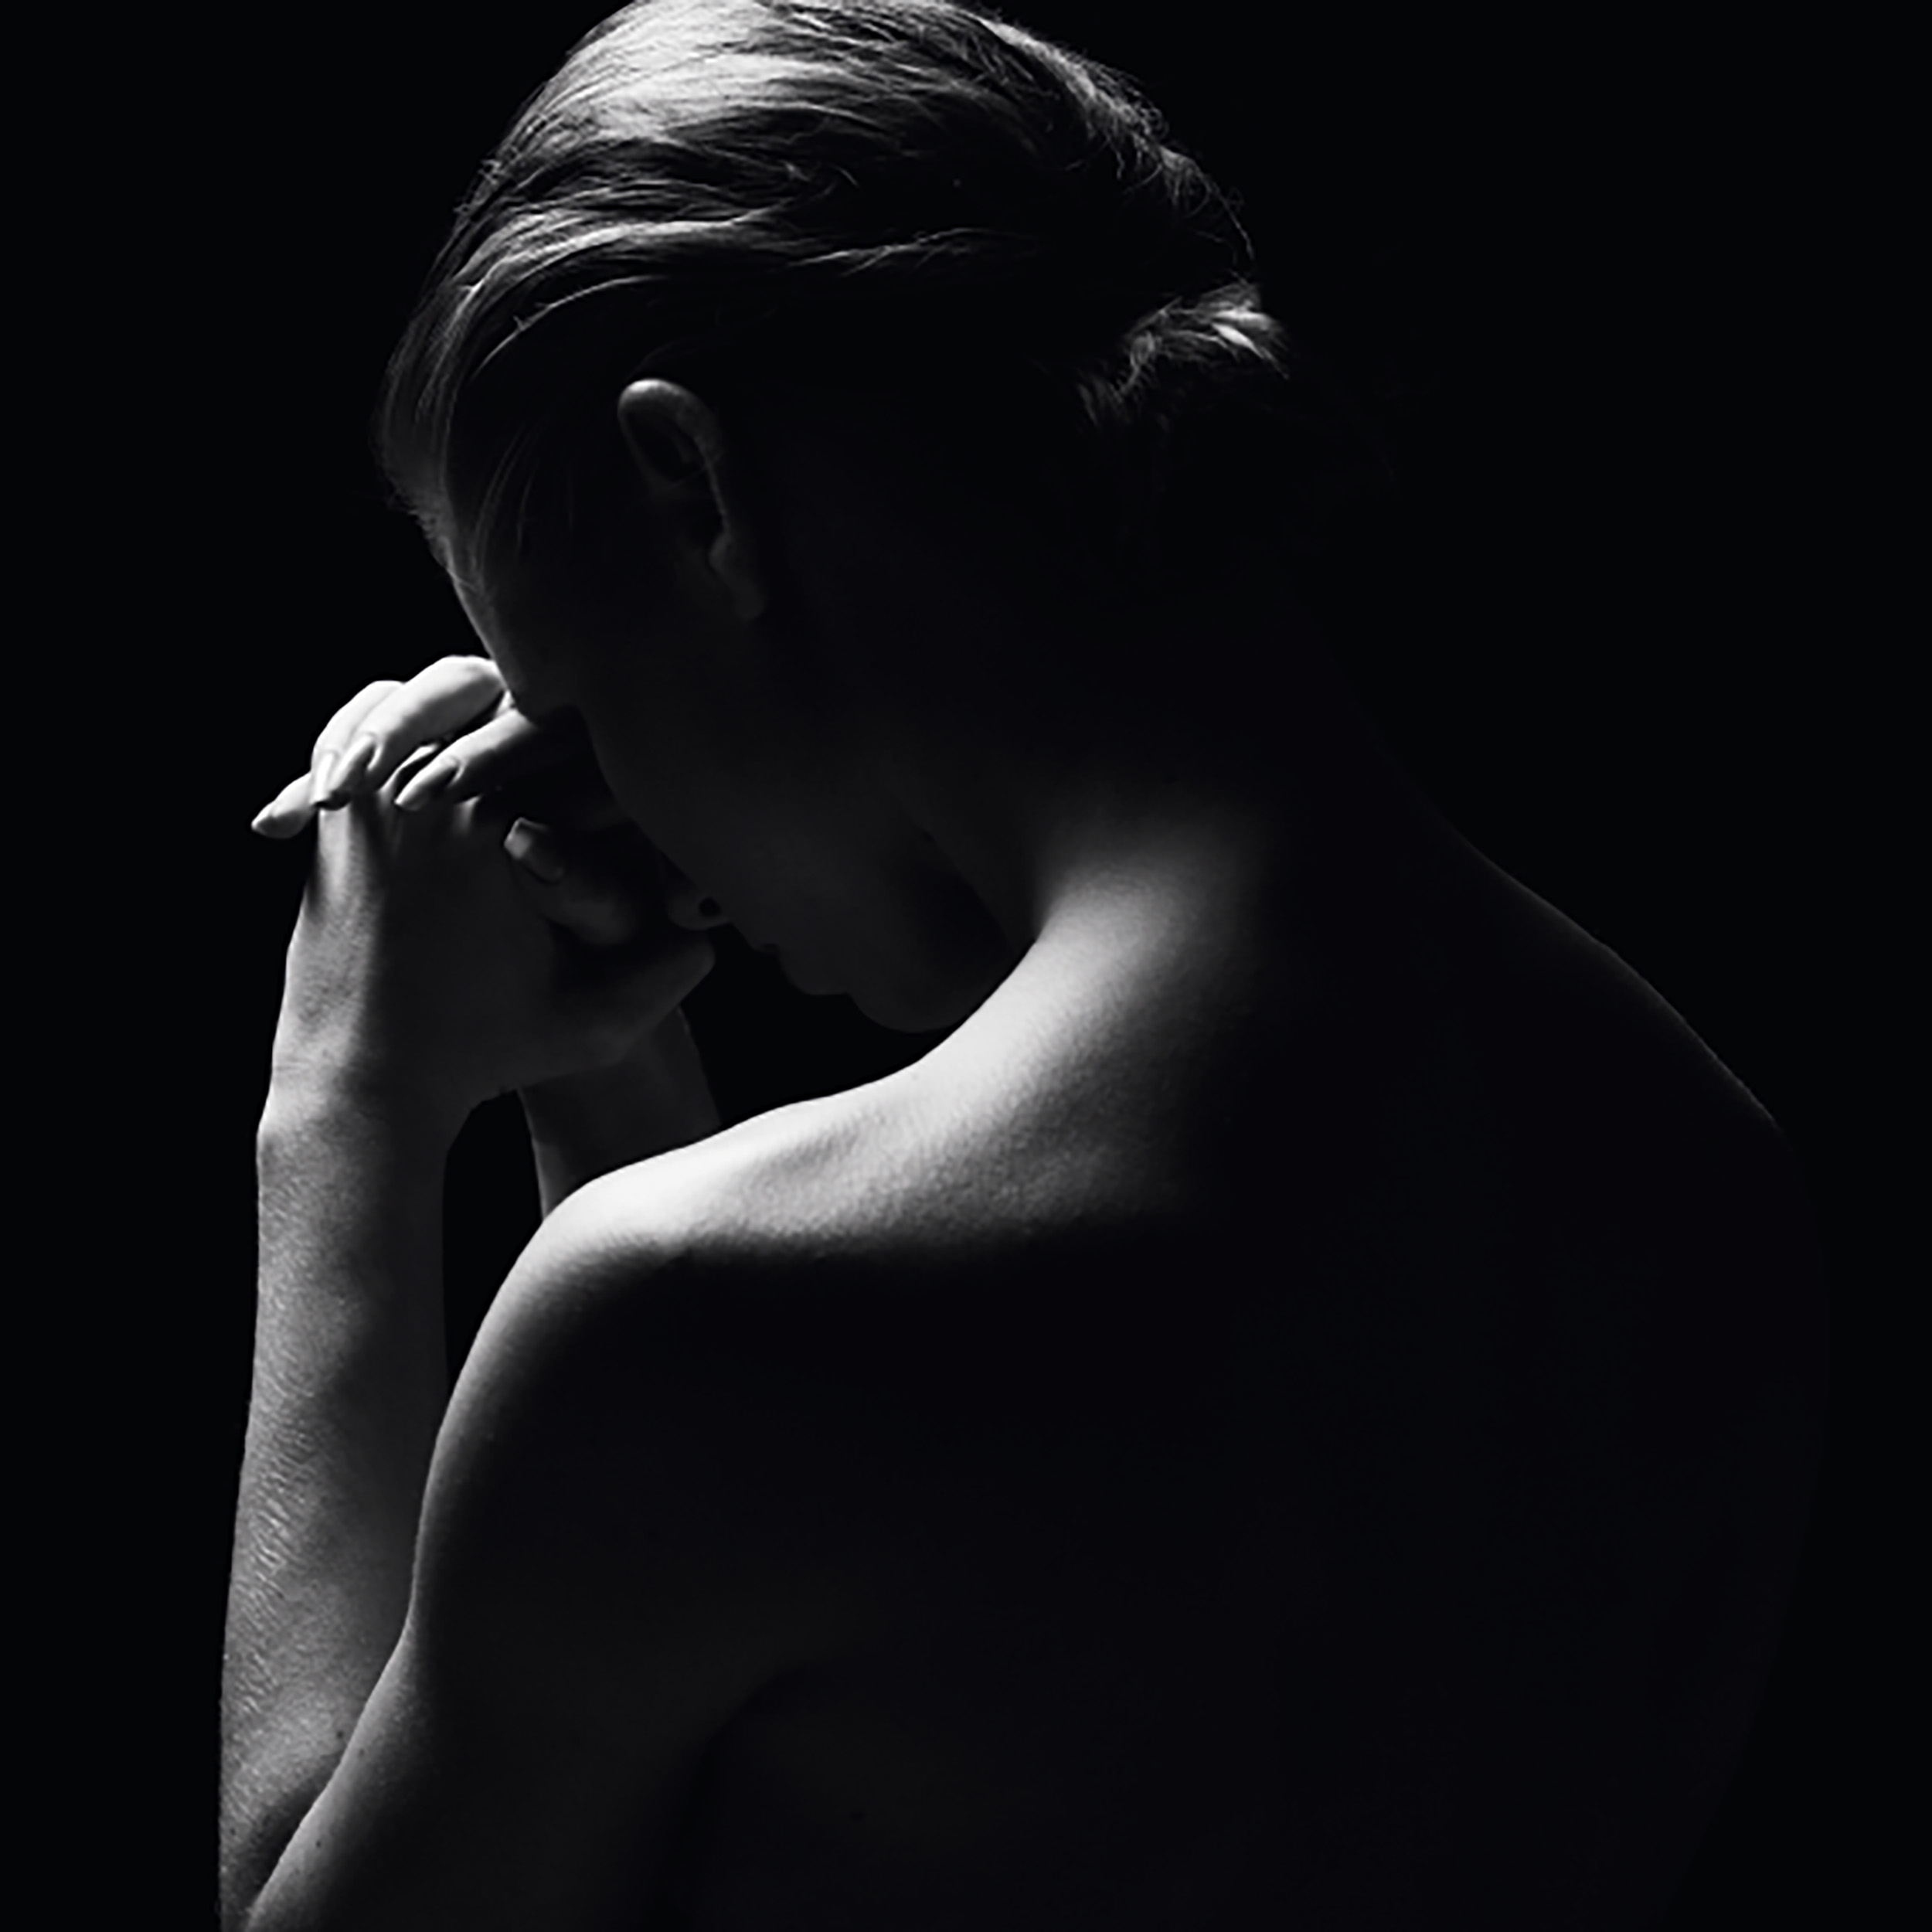 Fotografie - Masterclass zwart wit